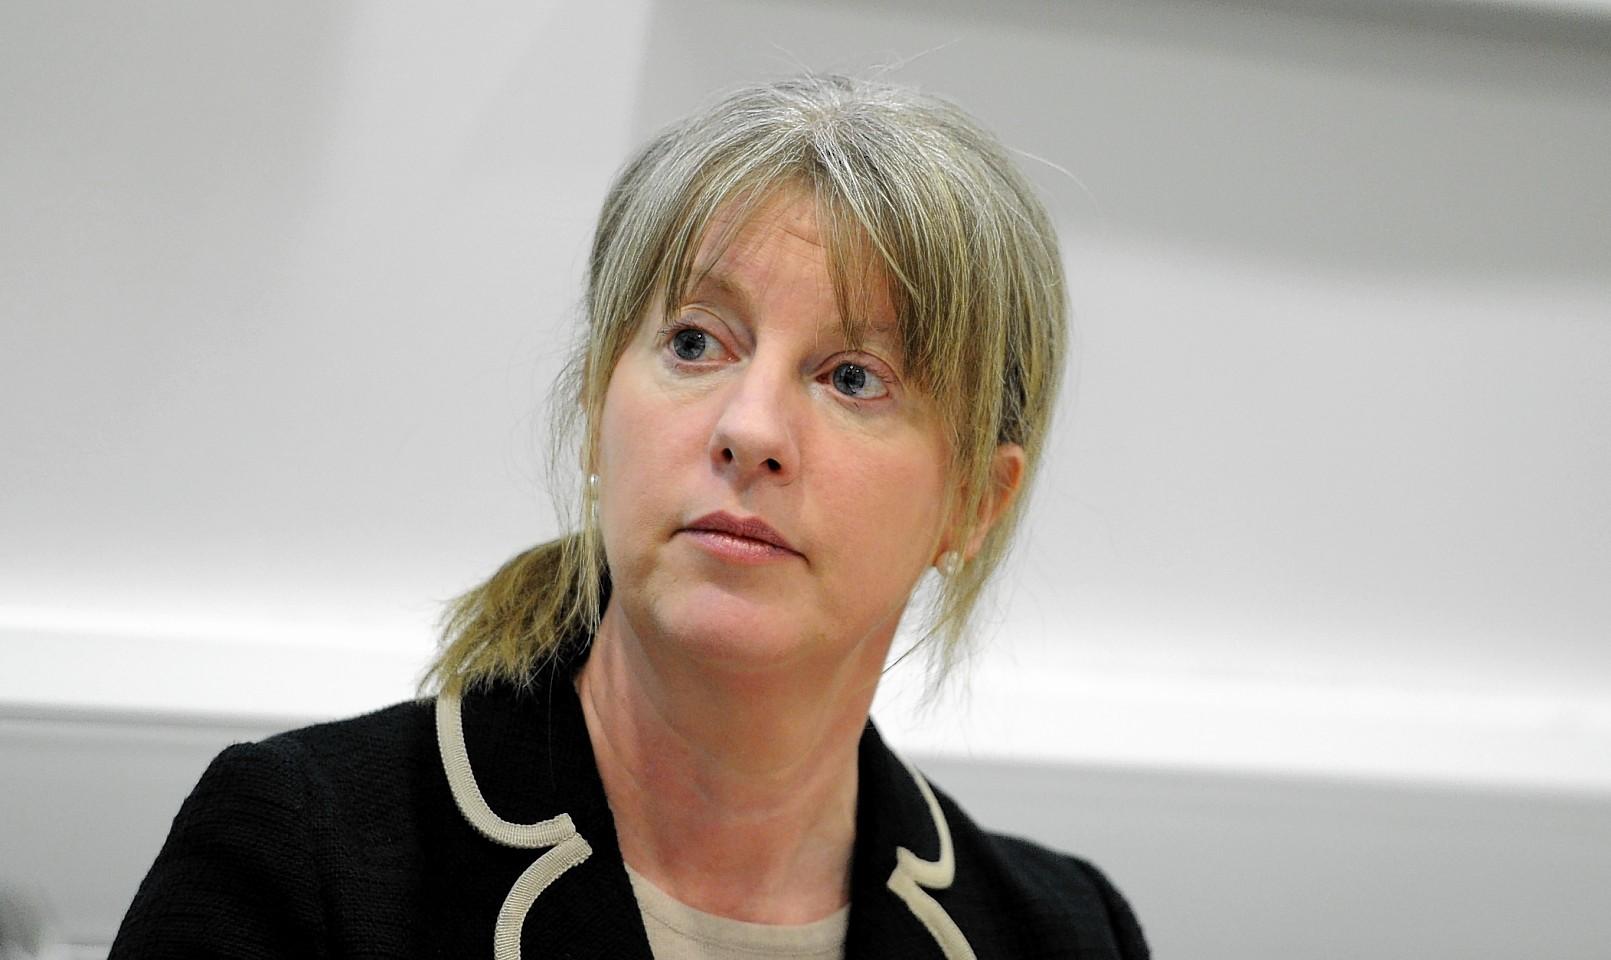 Health secretary Shona Robison